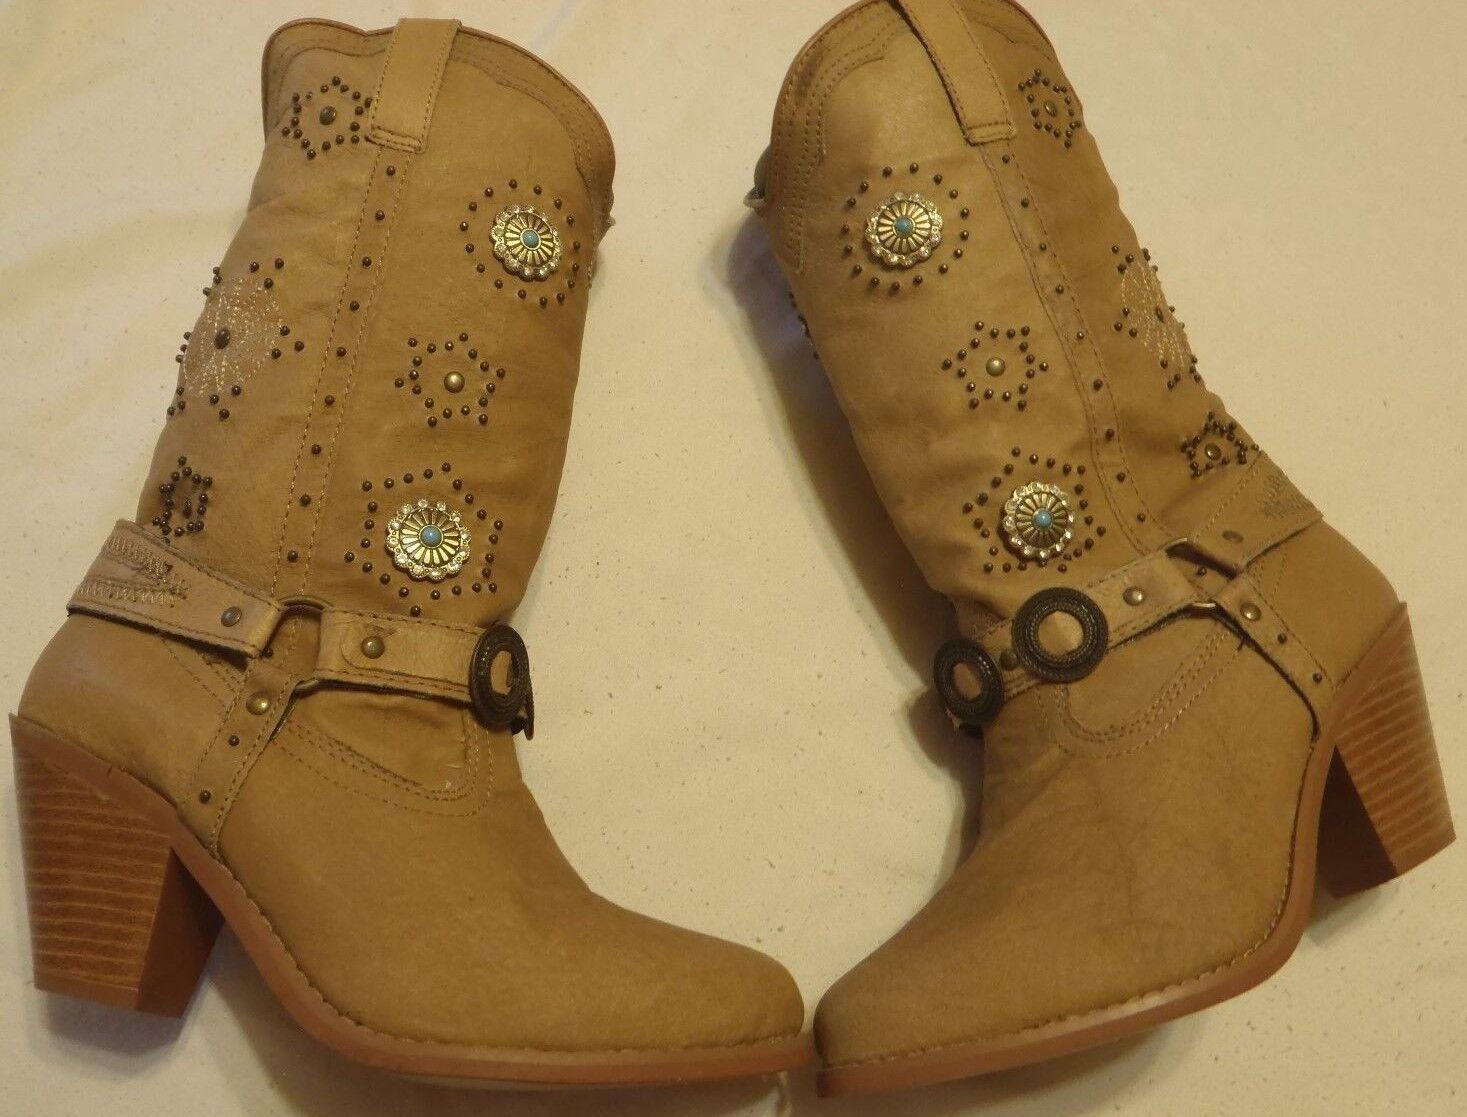 Dingo DI 566 Boots Women's Size 6 1 2 2 2  Tan Leather Western Fashion Dancer Boots e18a66